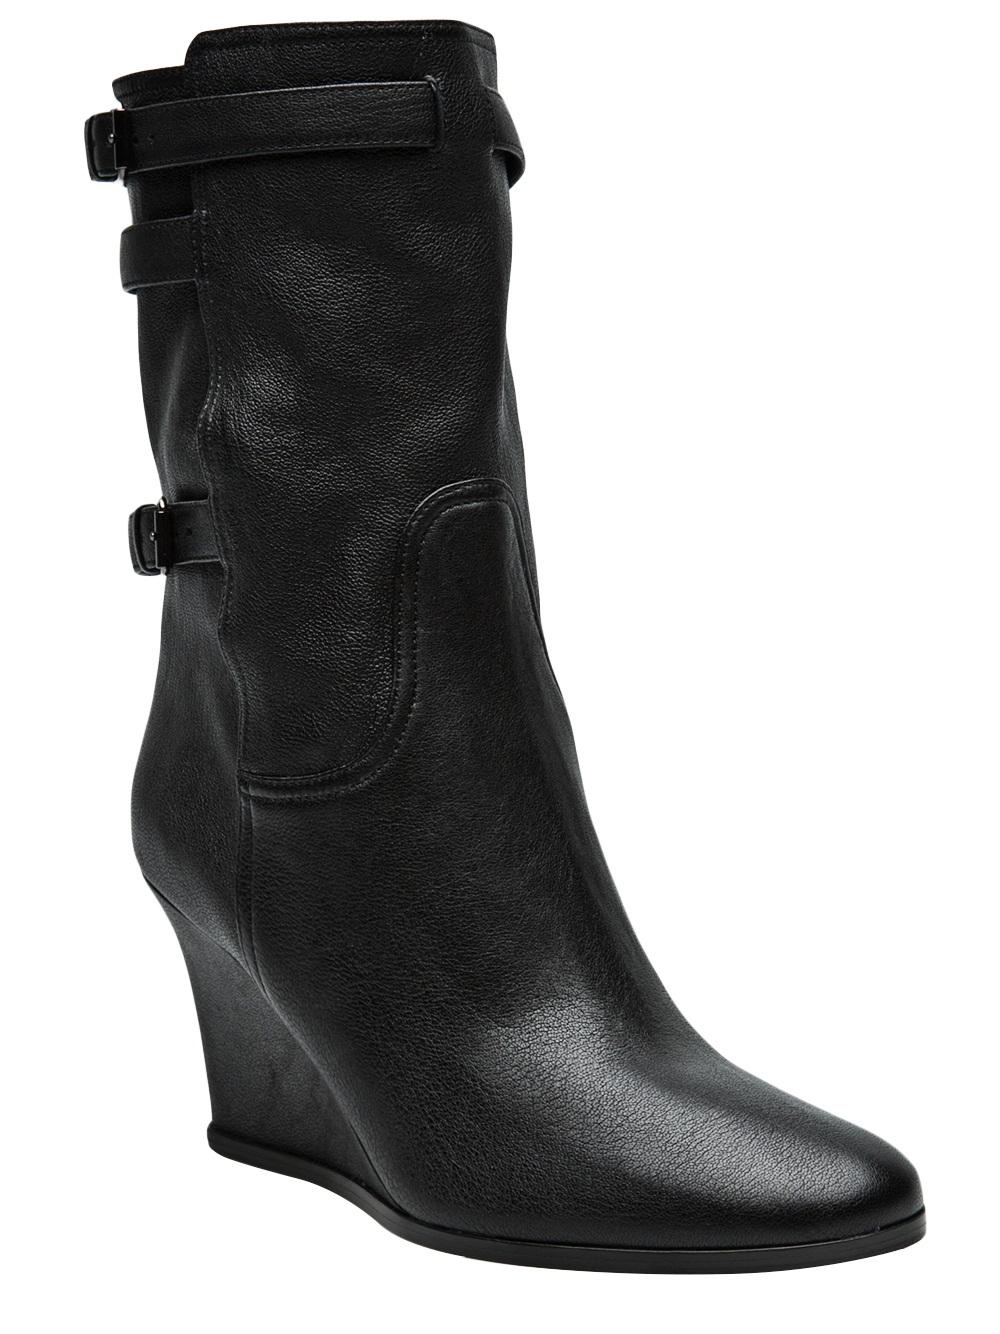 lanvin wedge bootie in black lyst